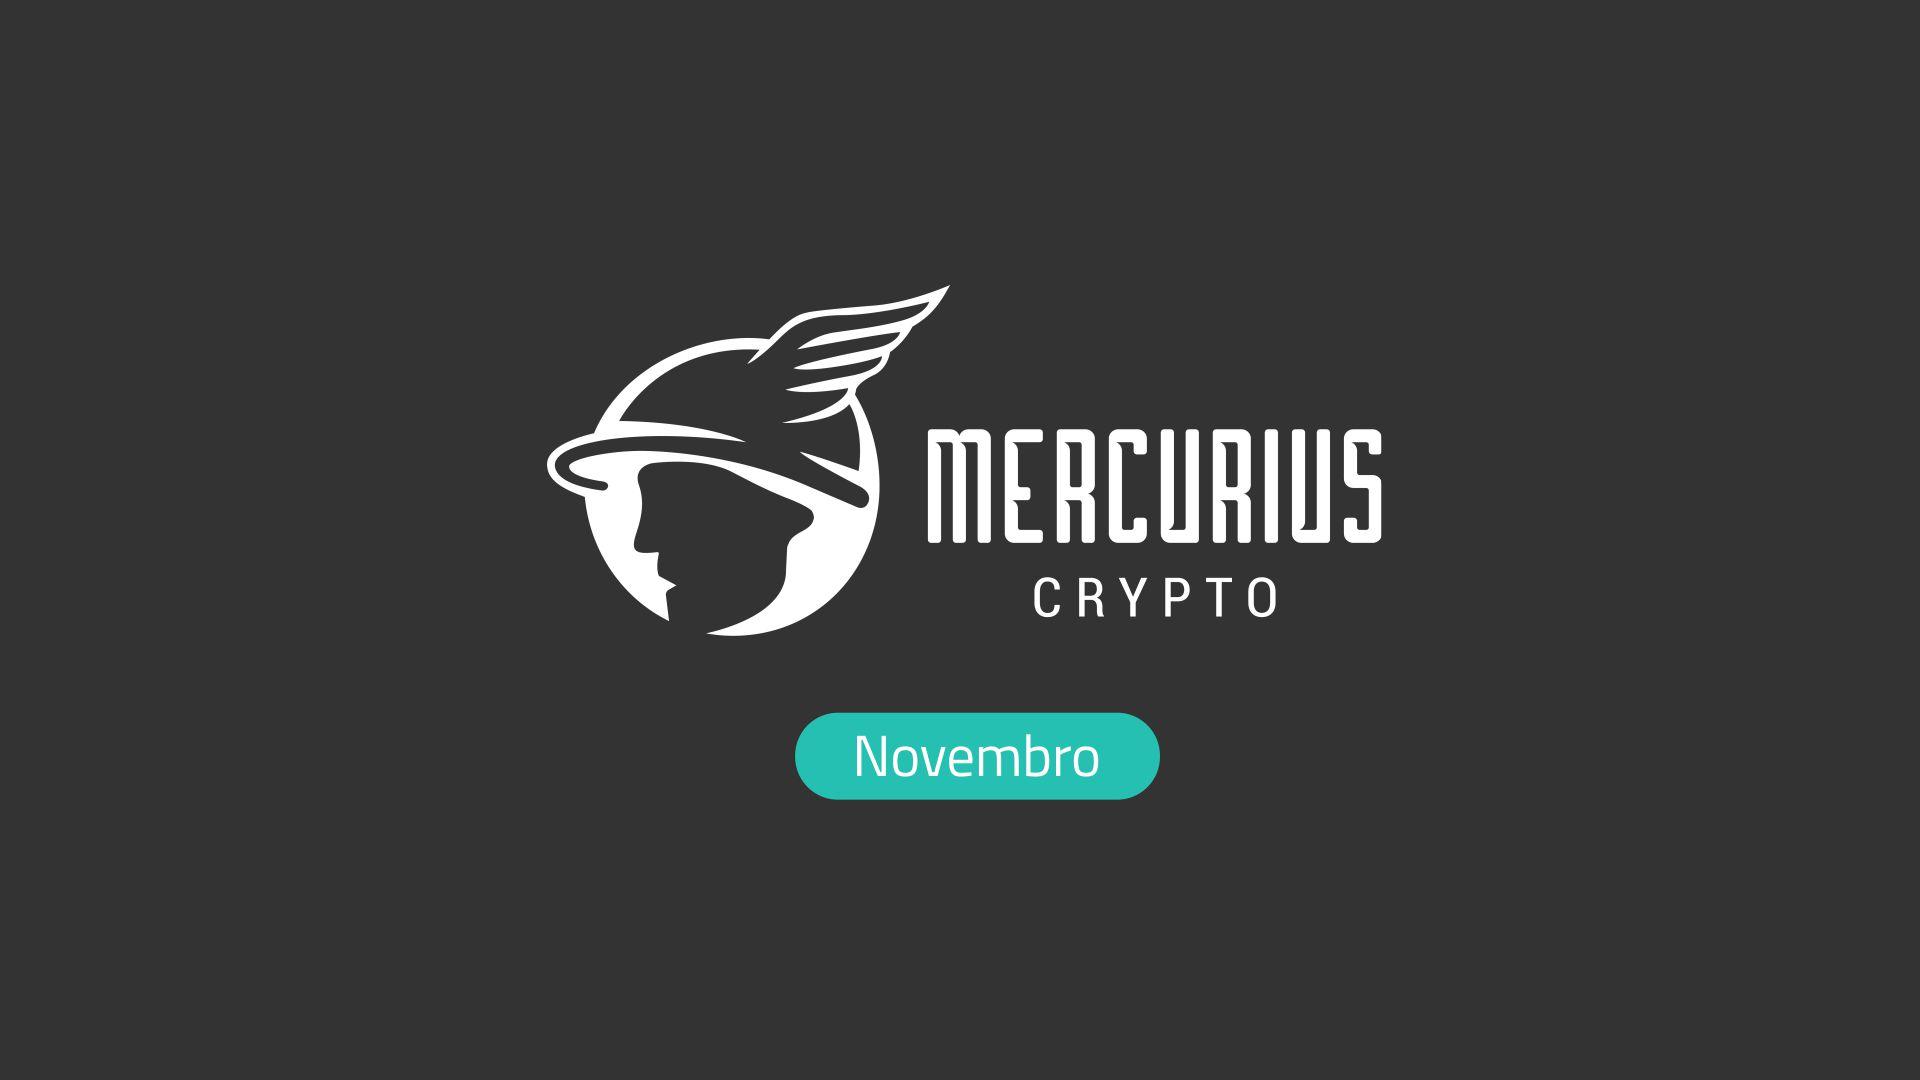 Ethereum 2.0 e a Nova Era Cripto: Report de Novembro da Mercurius Crypto